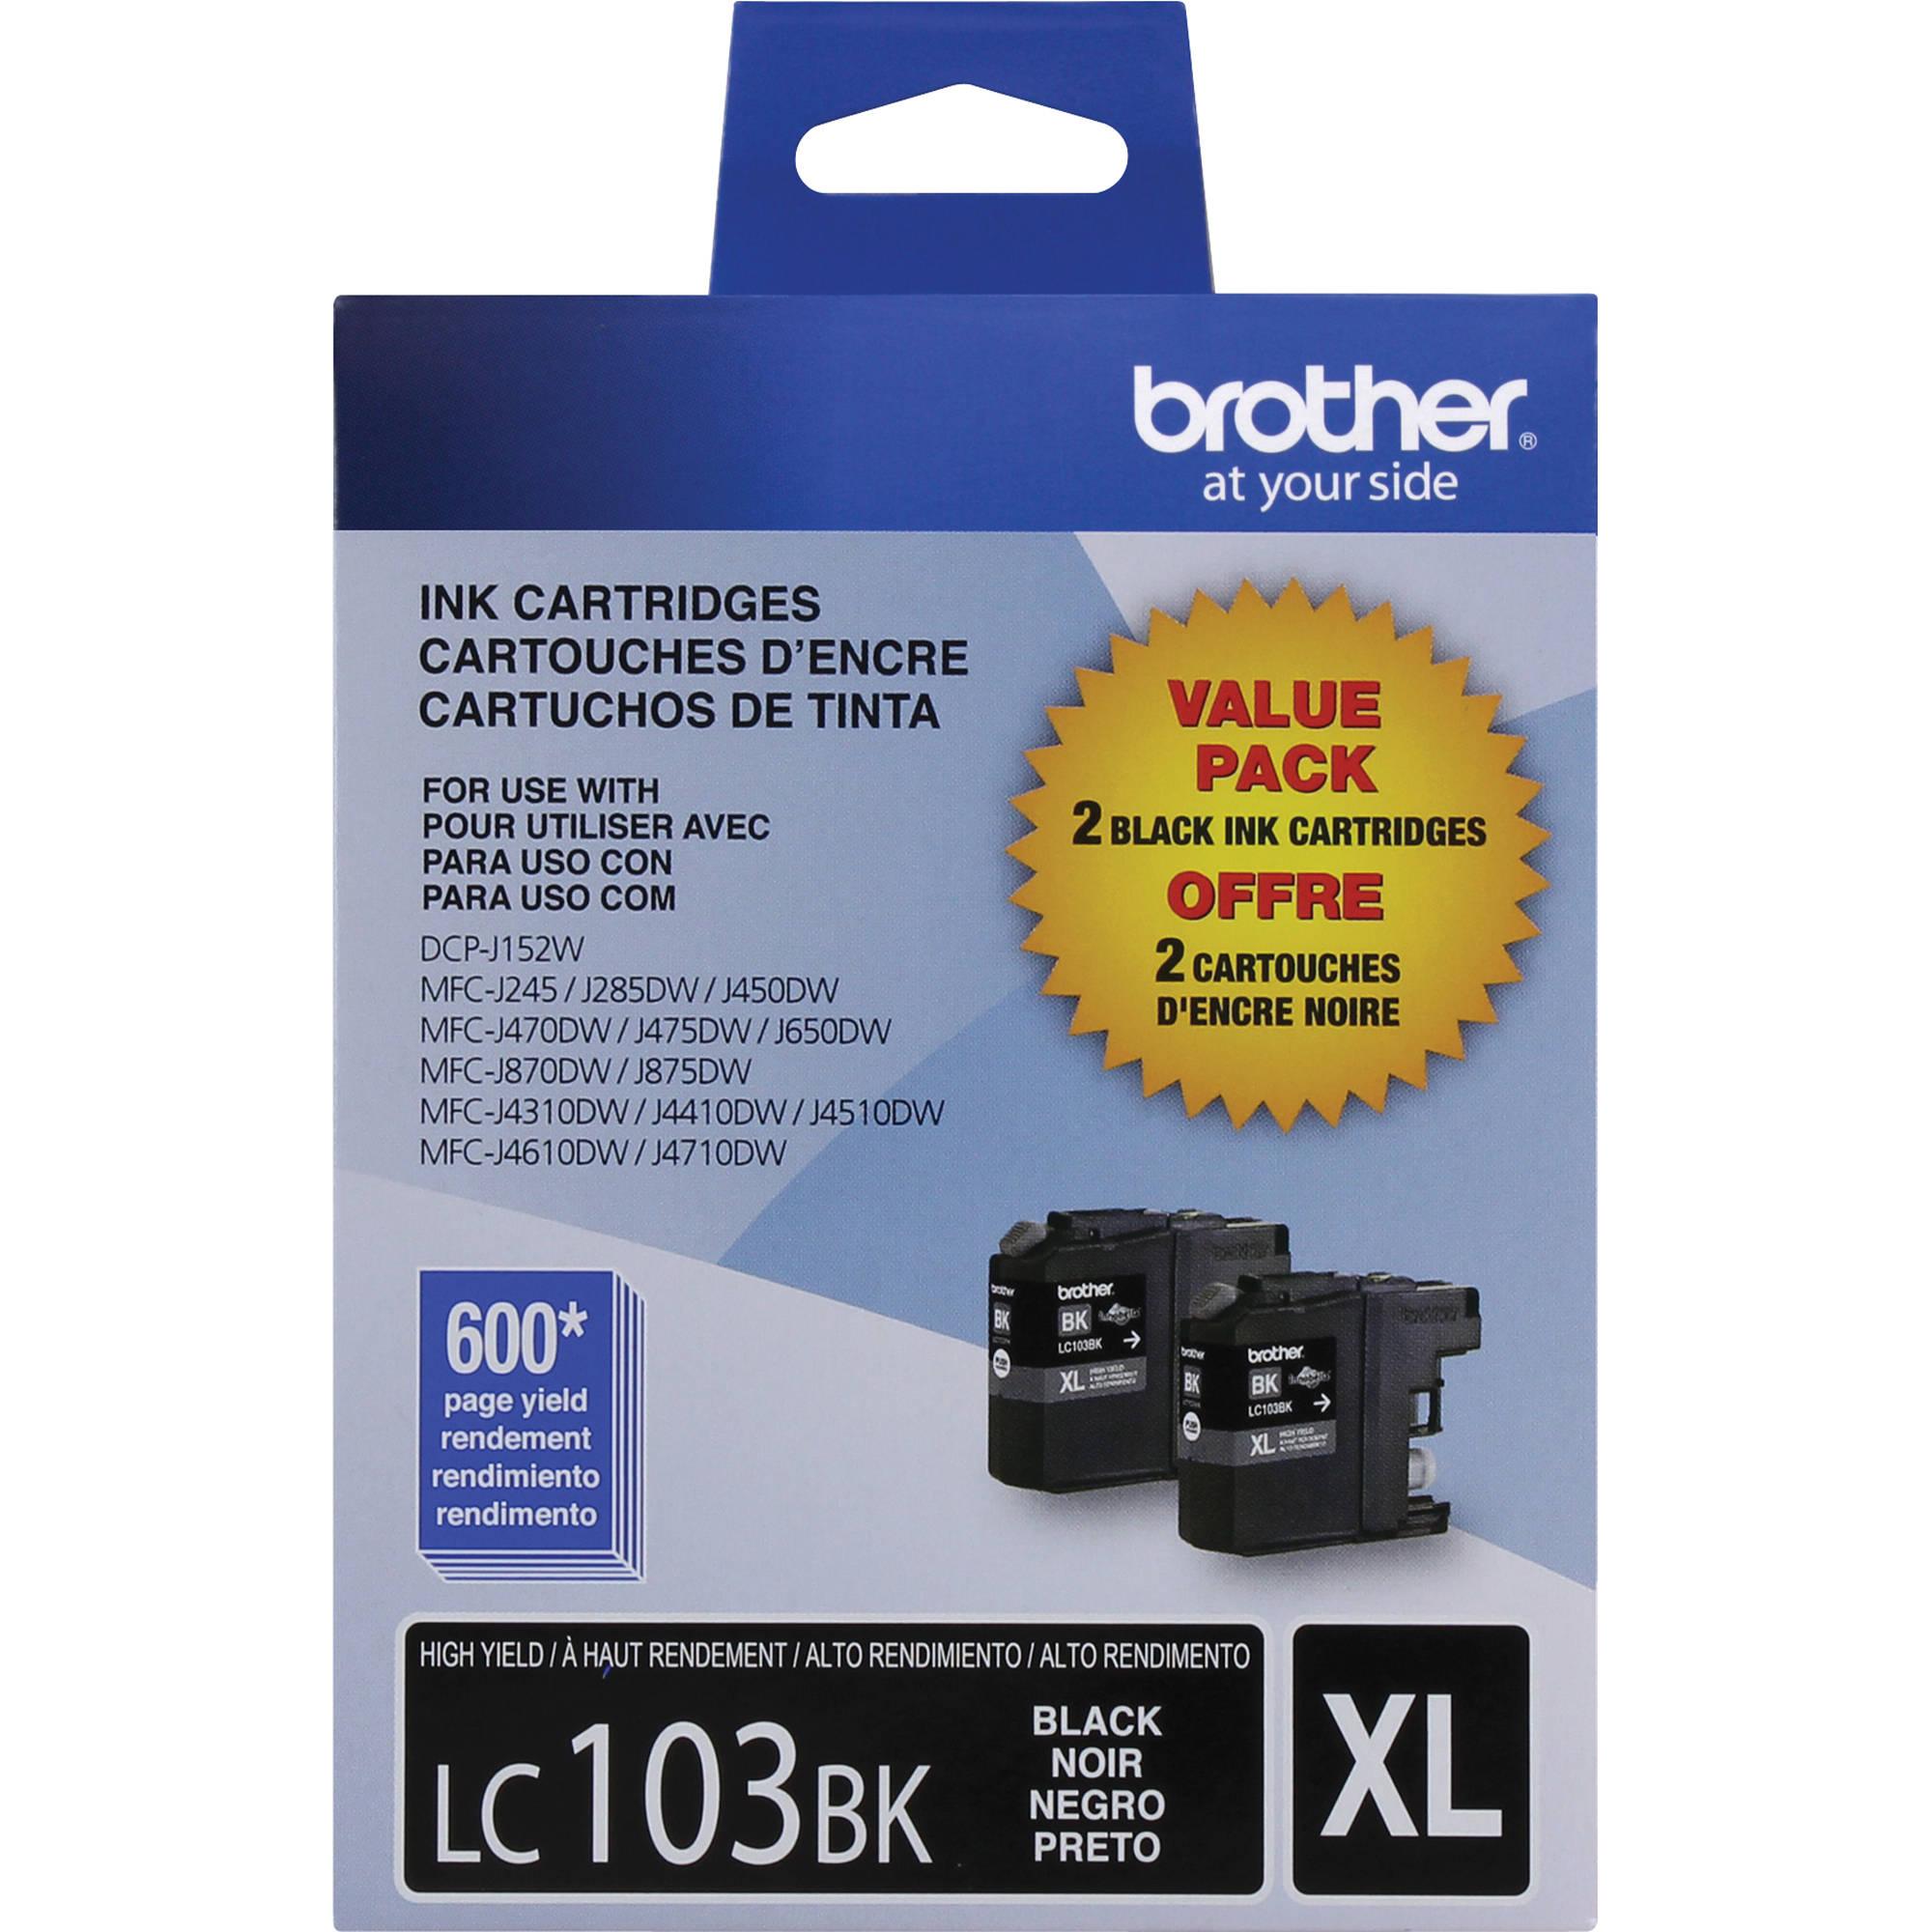 Brother LC103BK Innobella High Yield XL Ink Cartridge (2-Pack, Black)